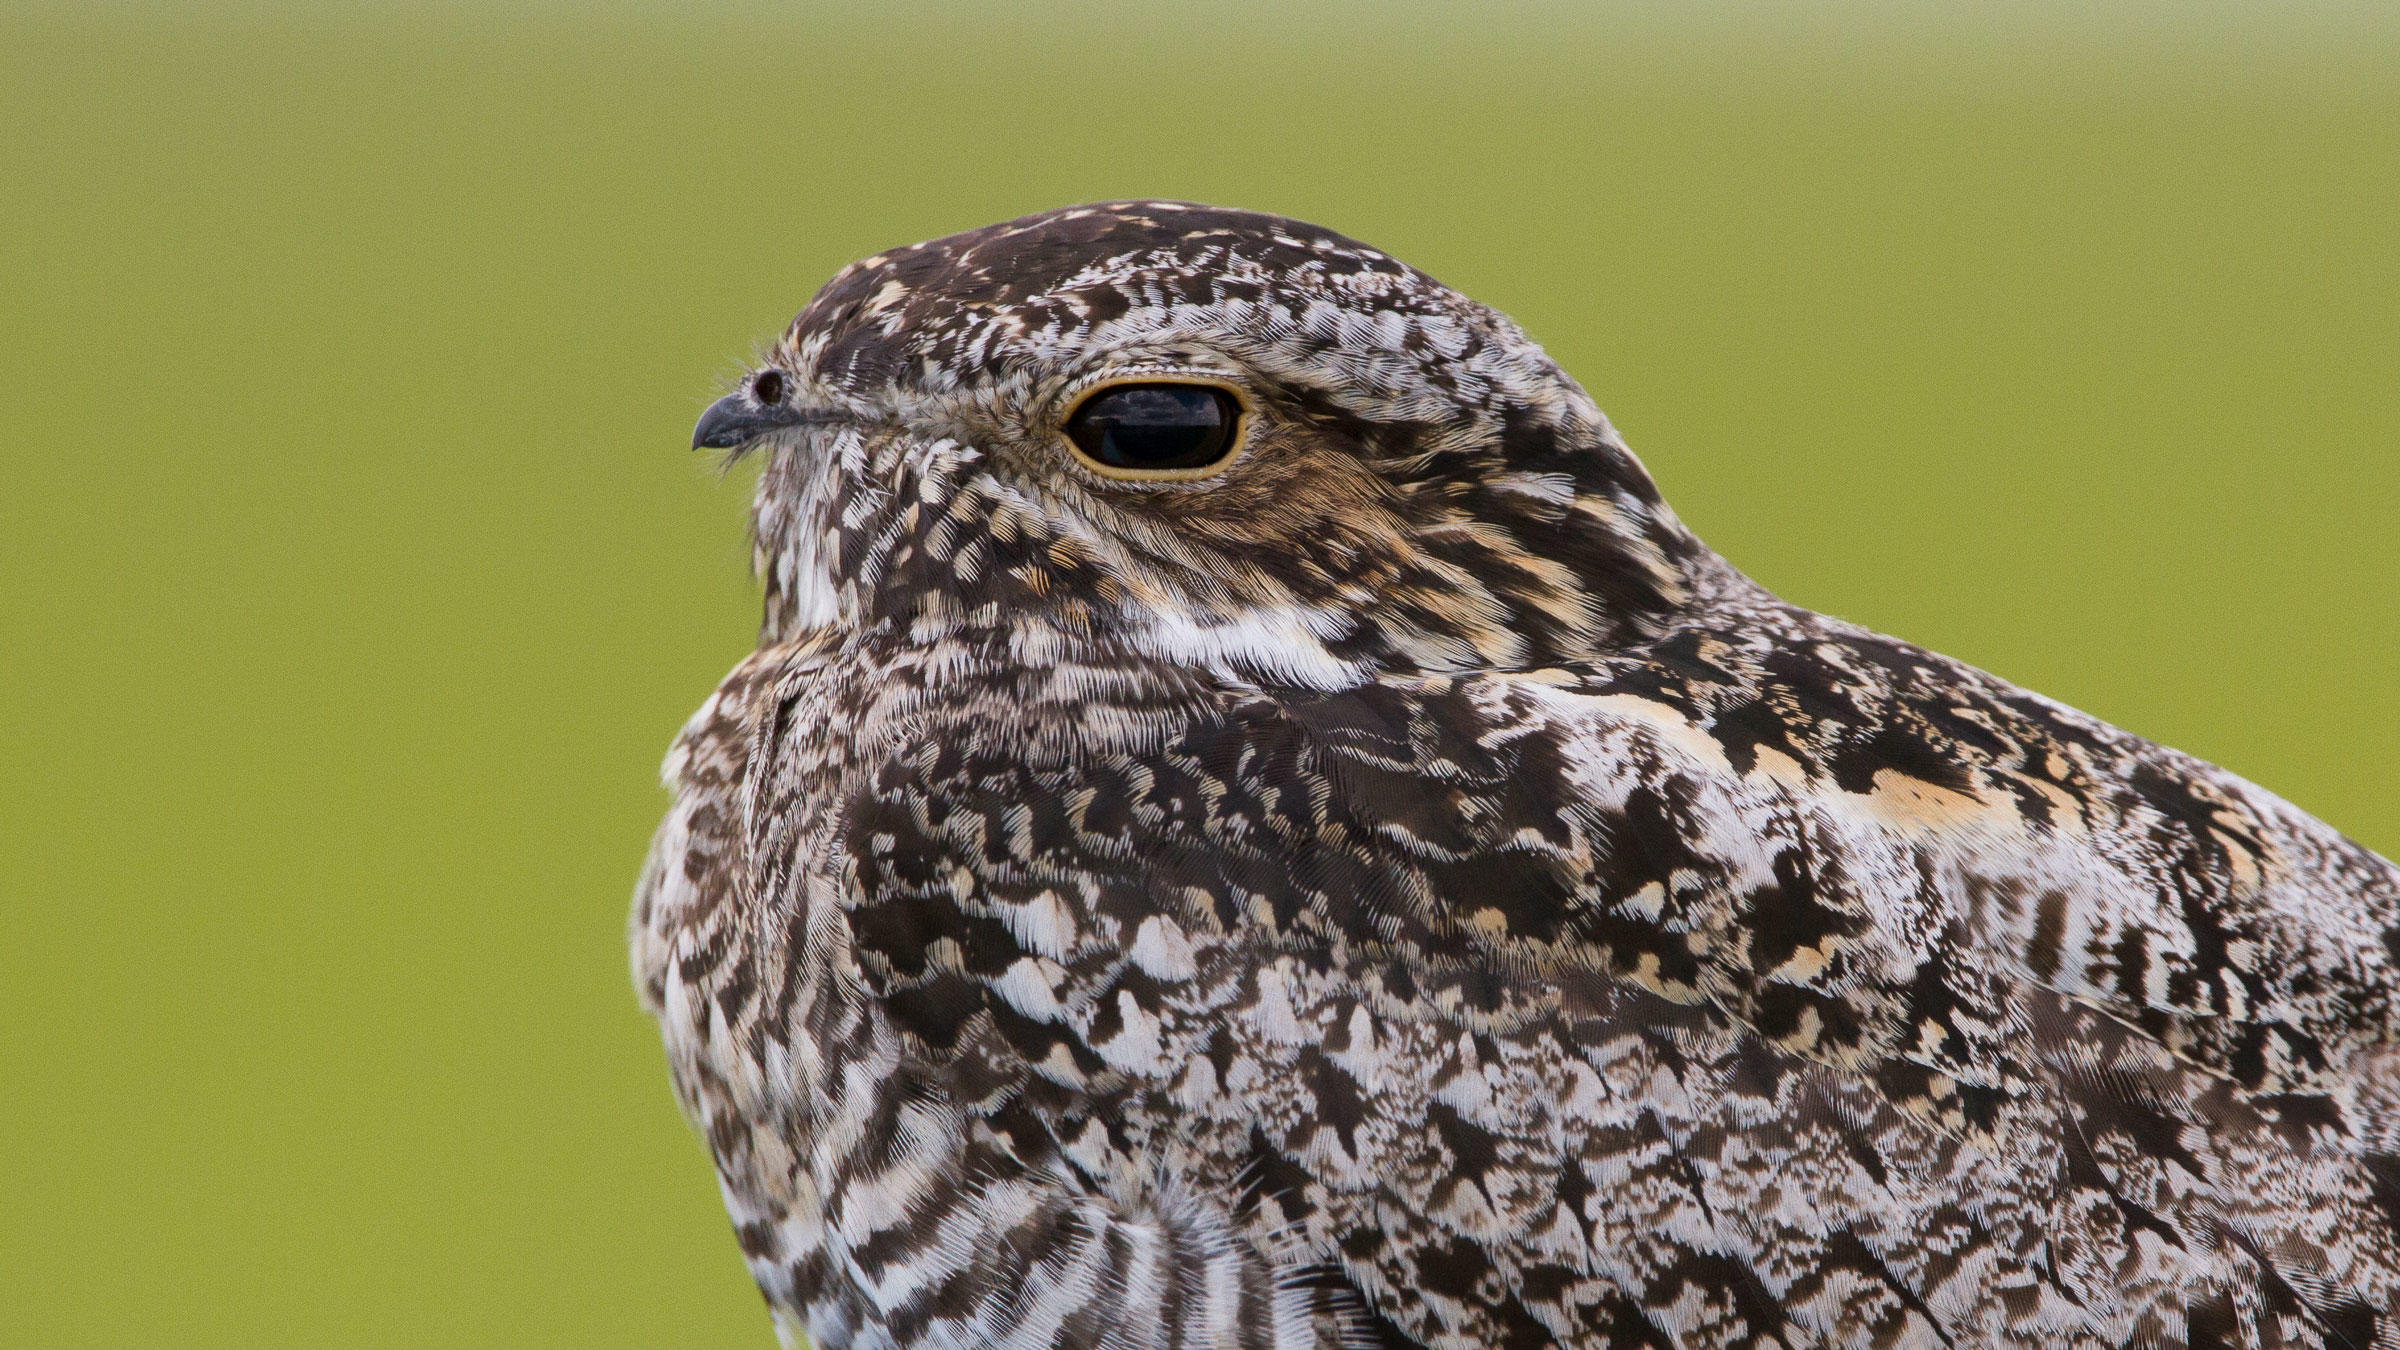 Common Nighthawk.